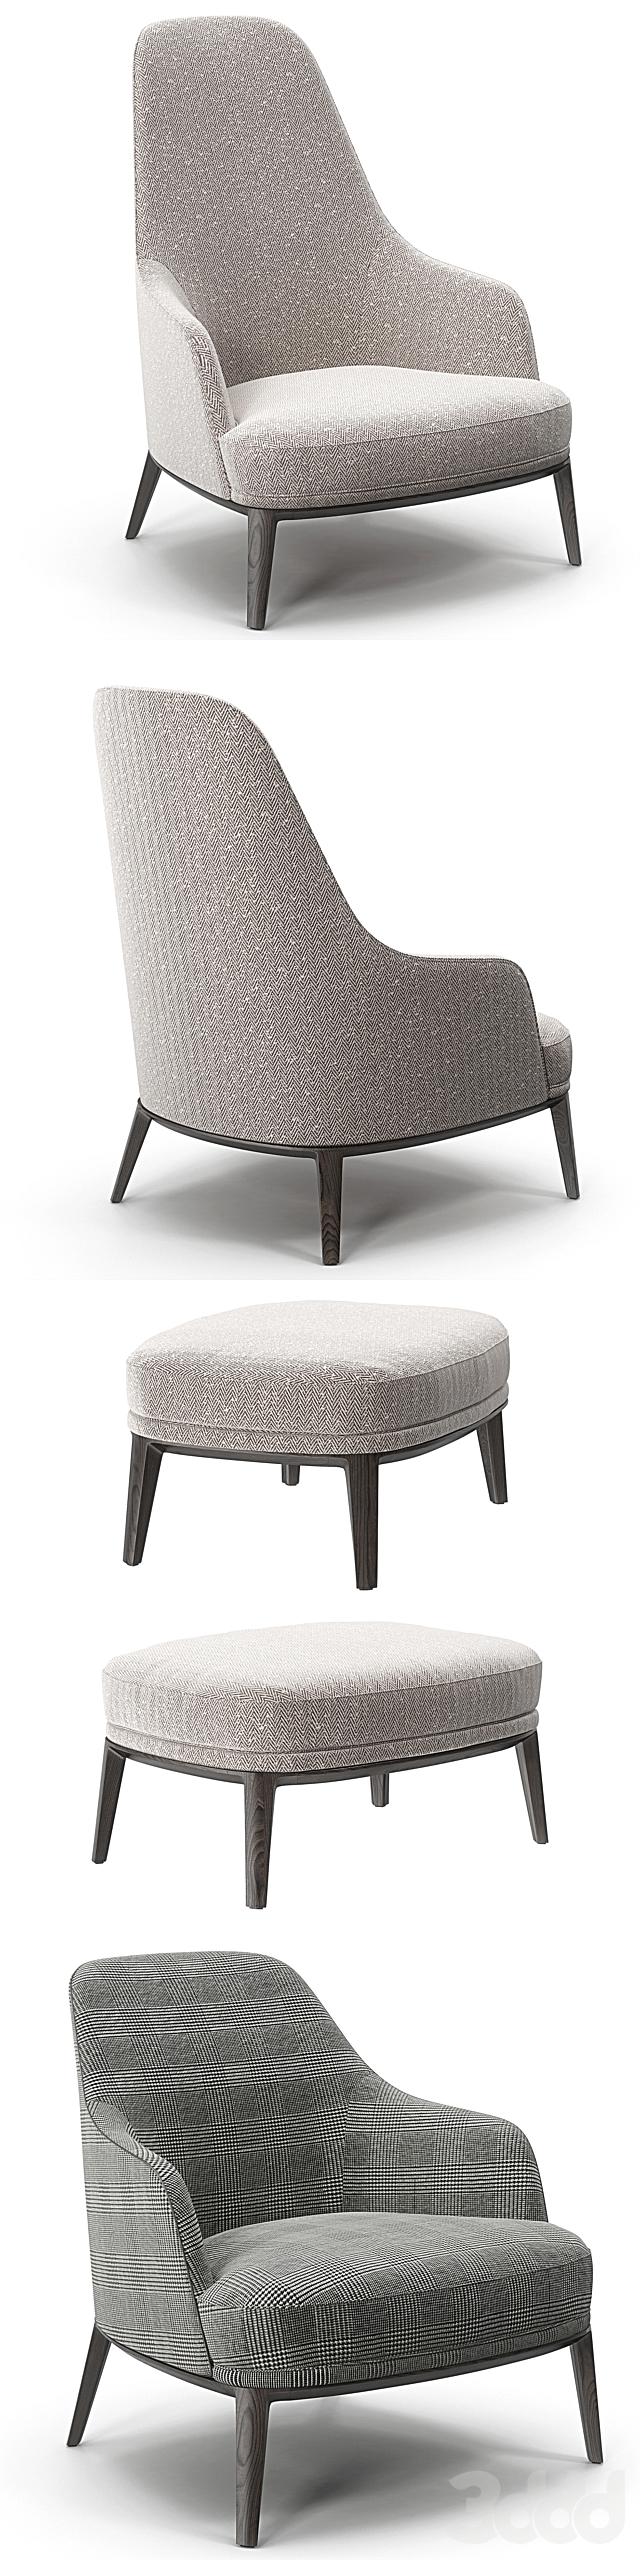 Poliform Jane Large, Lounge armchairs set